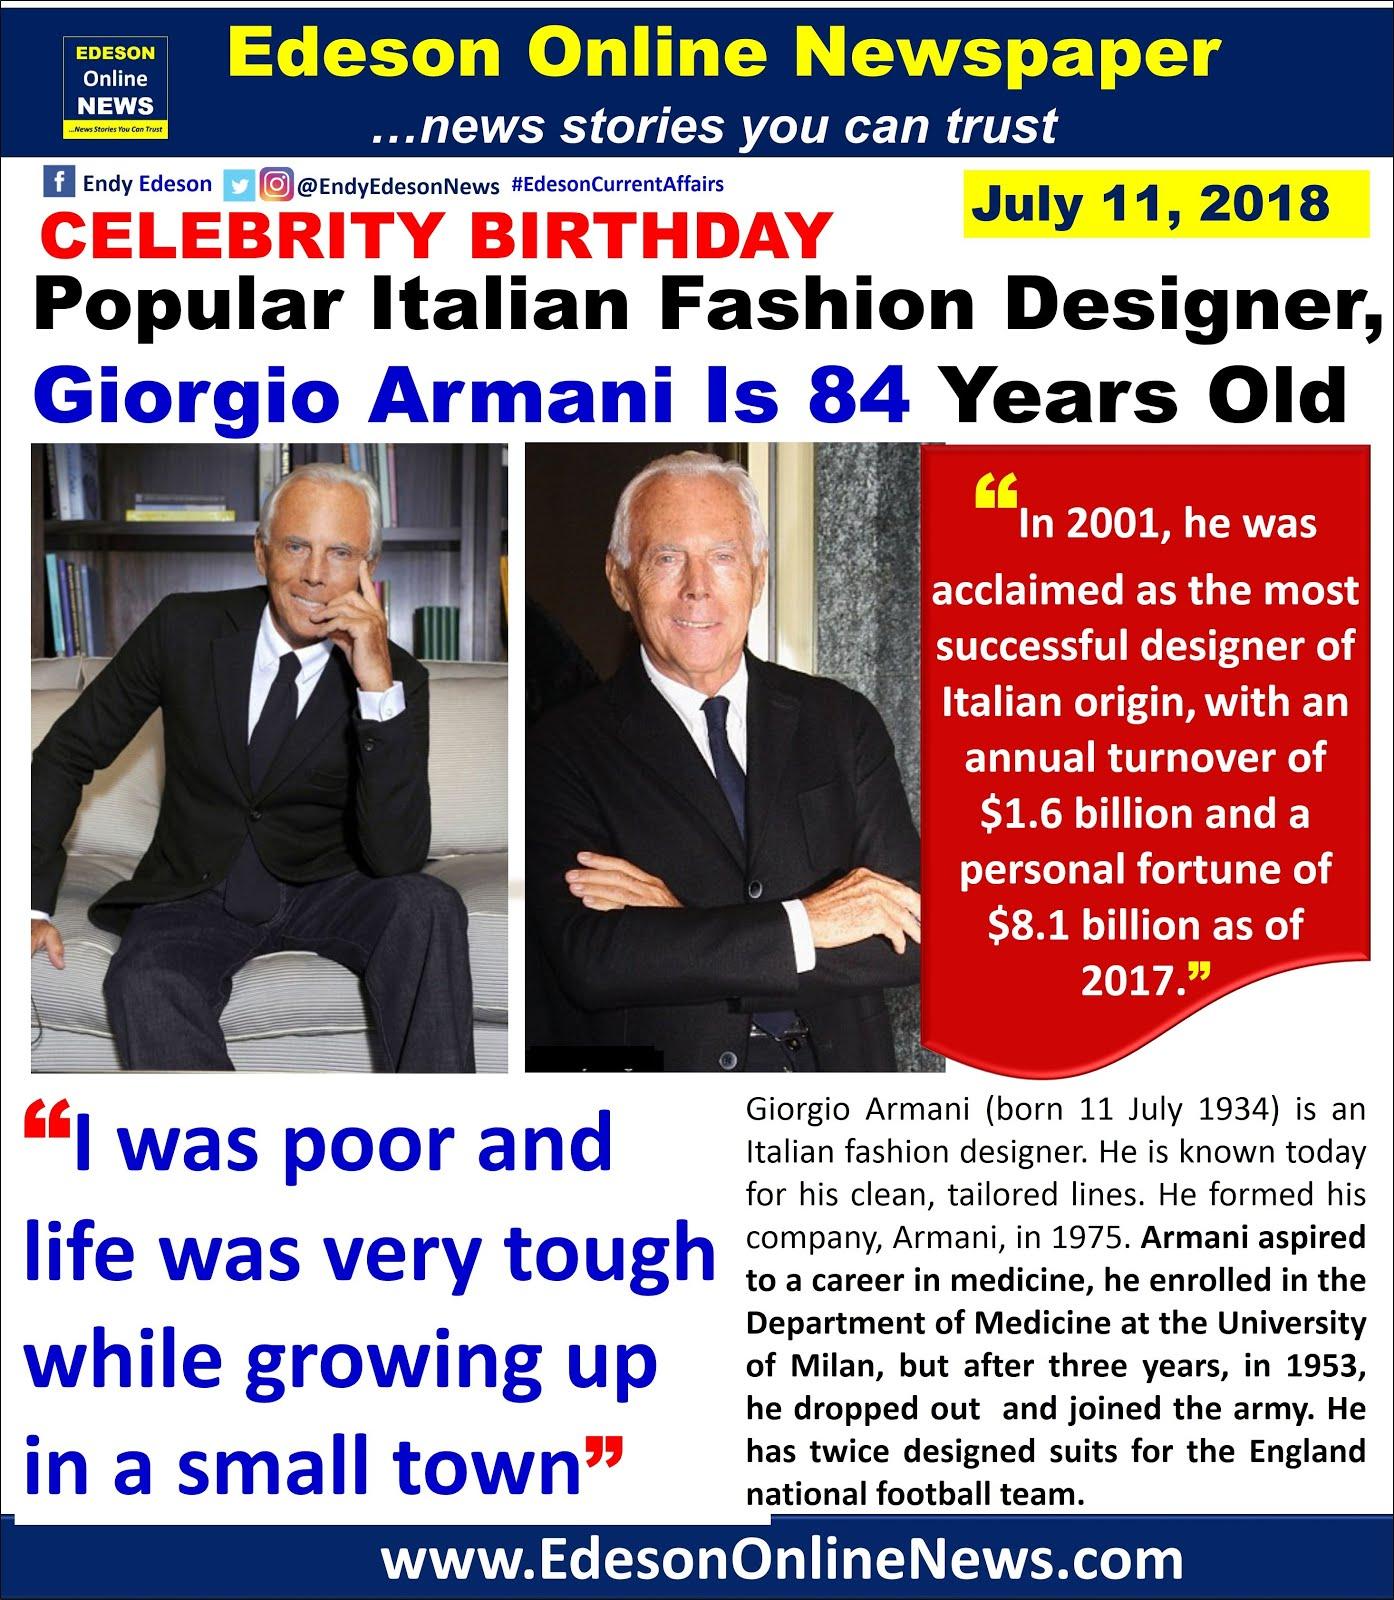 Edeson Online News Biography Italian Fashion Designer Giorgio Armani Is 84 Years Old